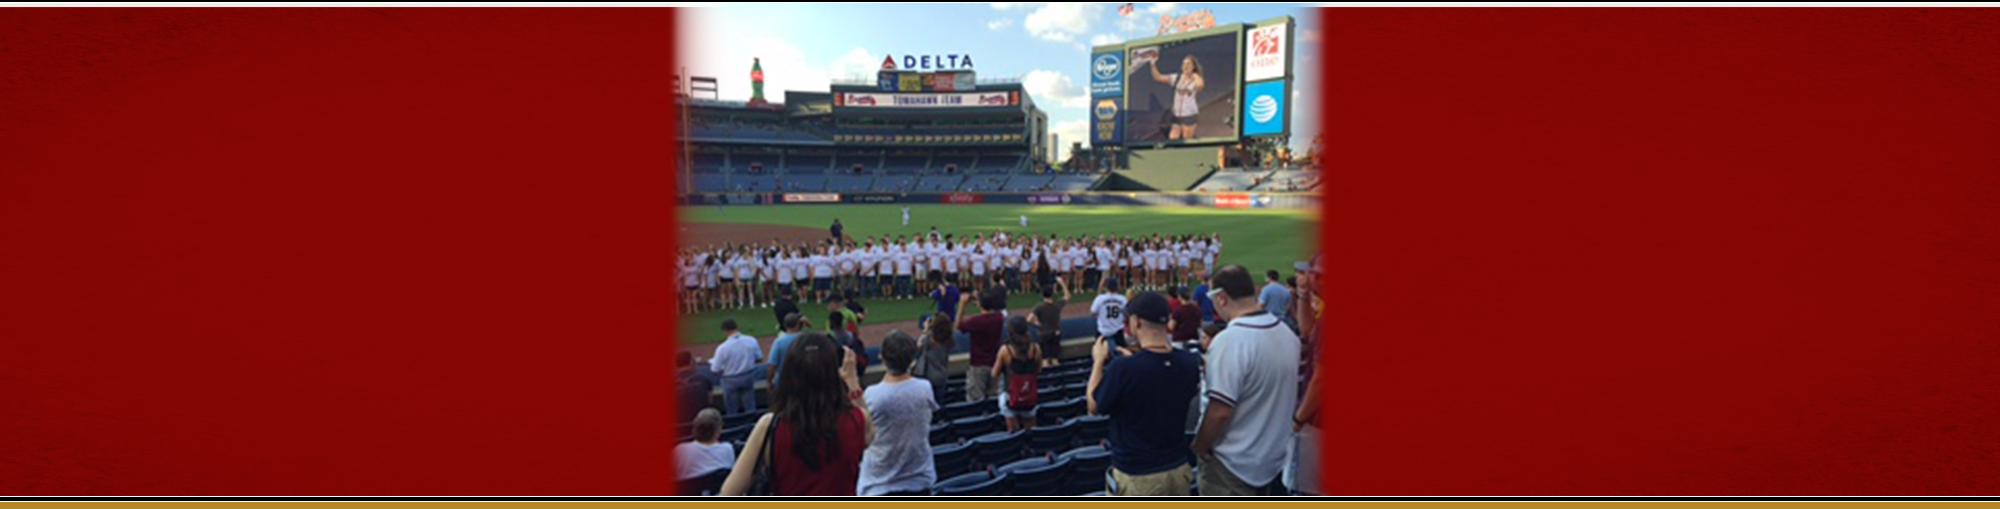 Chorus at Braves